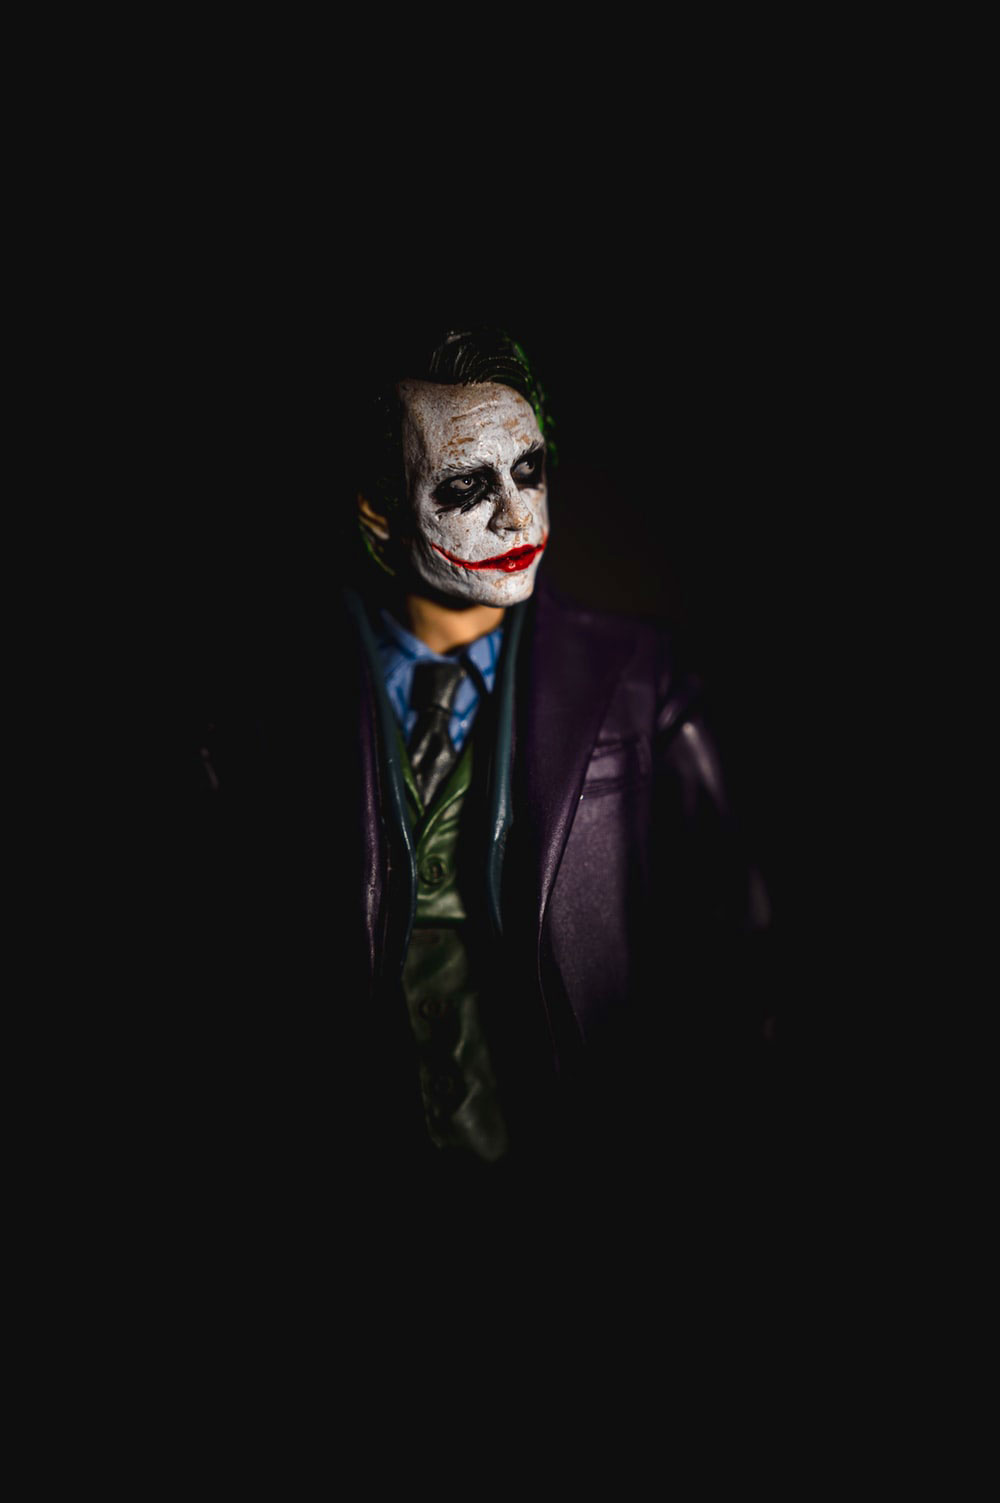 New Joker Dp Images photo 2021